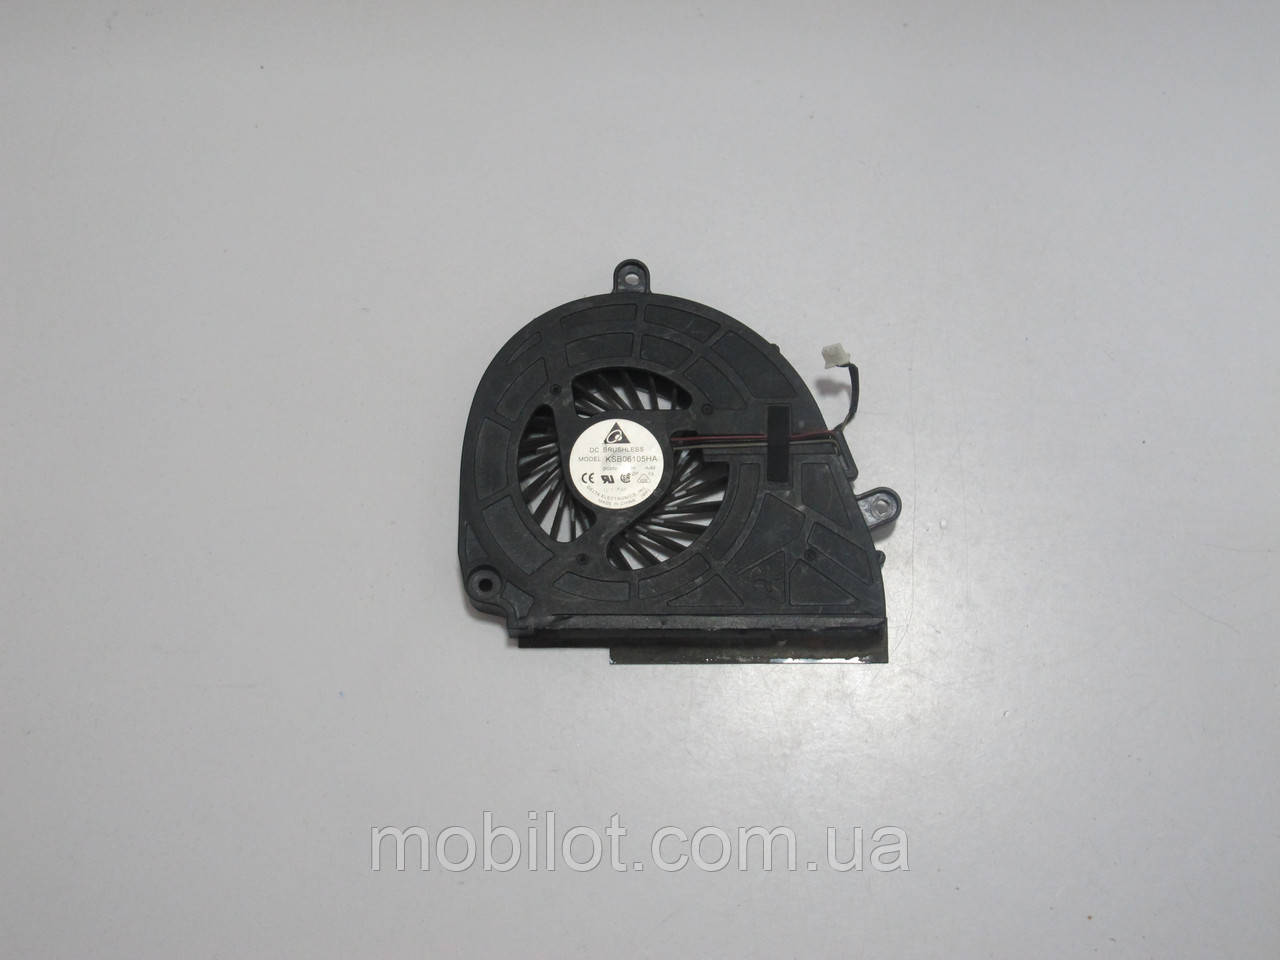 Система охлаждения (кулер) Acer 5750/ 5750G/ 5755/ 5755G/ P5WE0/ V3-571G (NZ-5022)